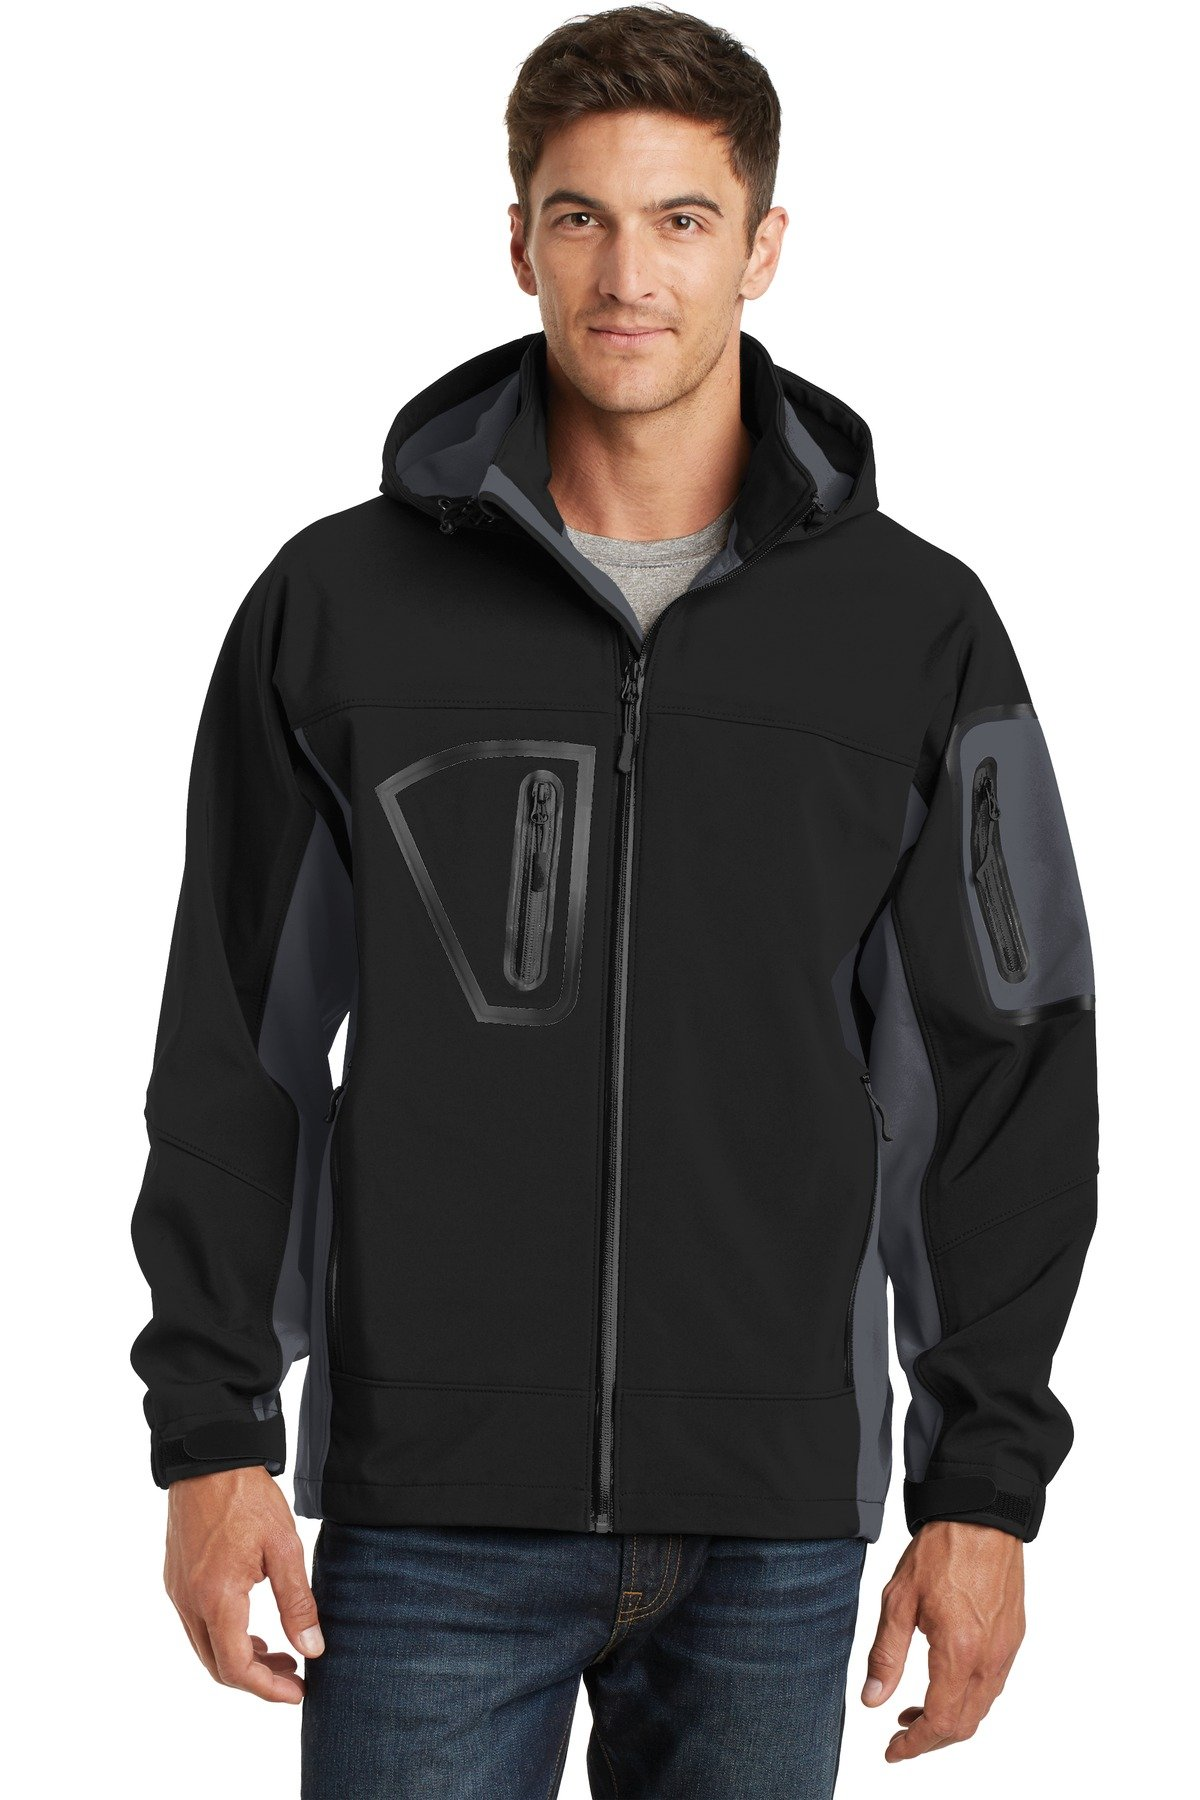 Port Authority Men's Waterproof Soft Shell Jacket L Black/Graphite